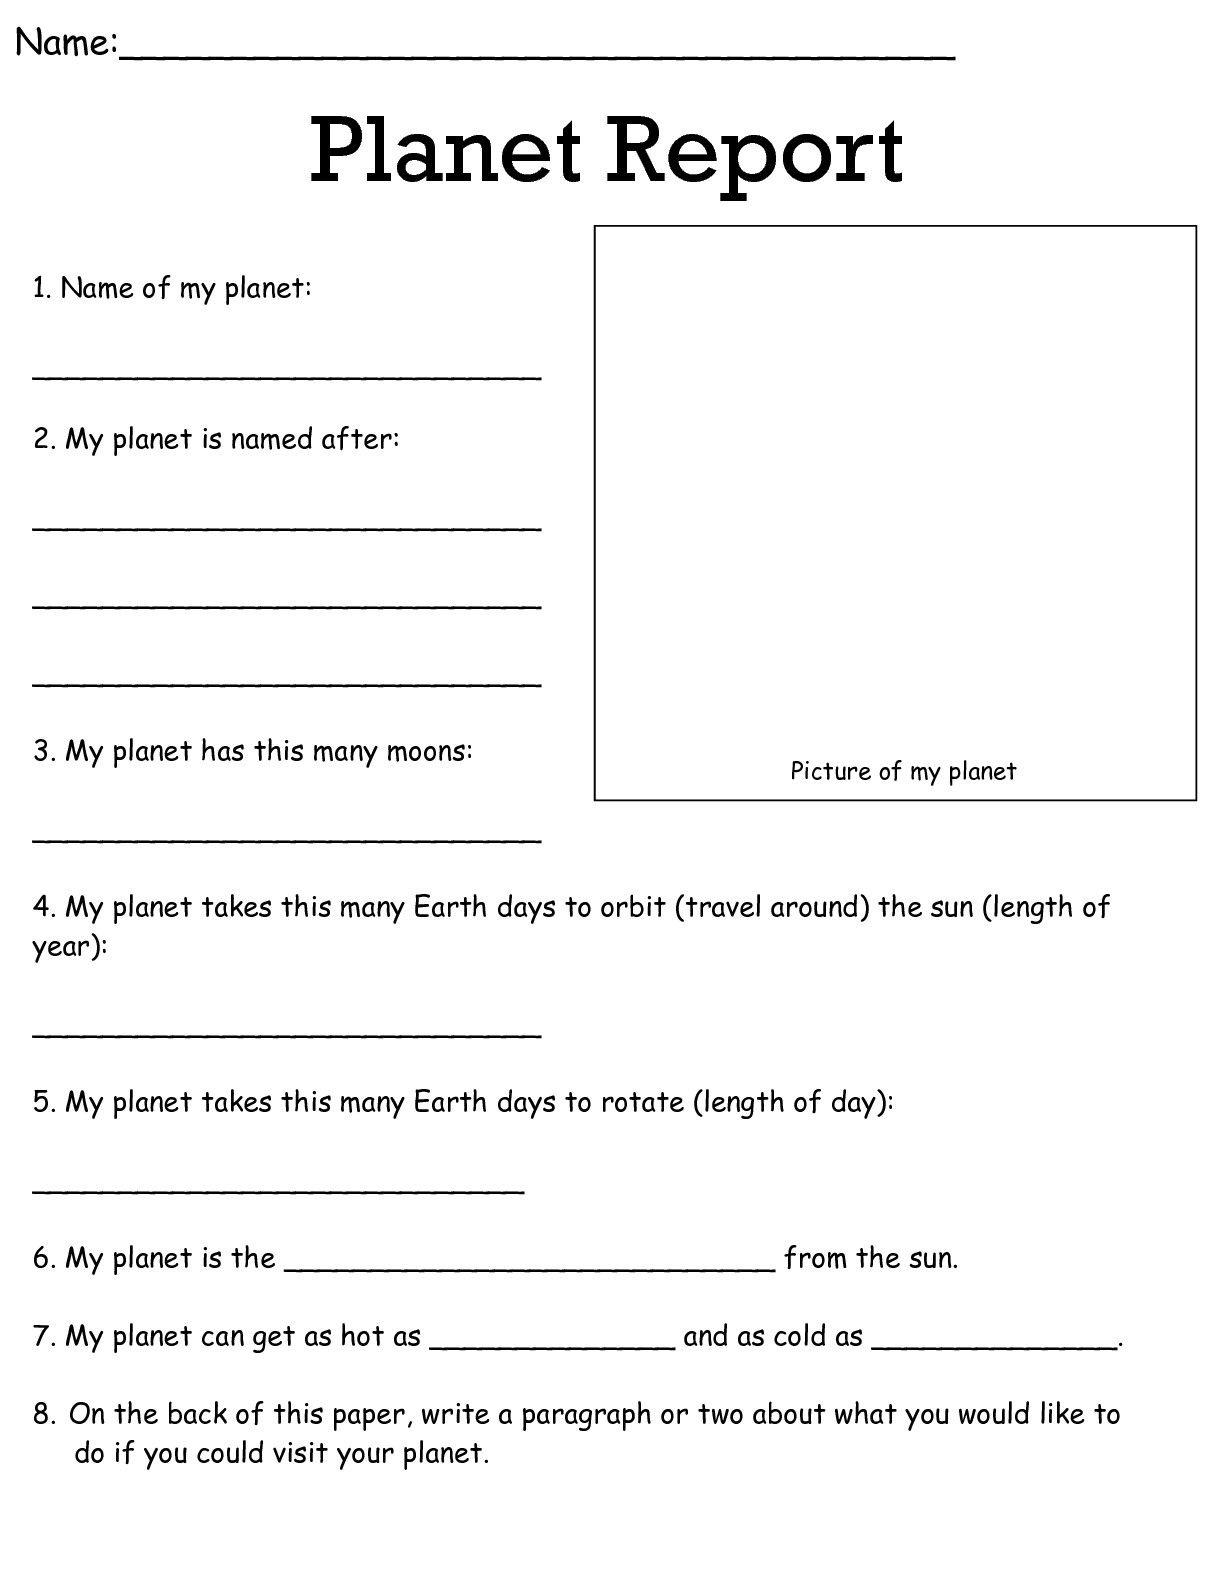 Job Worksheets 5Th &6Th | Science Worksheets Science Worksheets - Free Printable Science Worksheets For 2Nd Grade